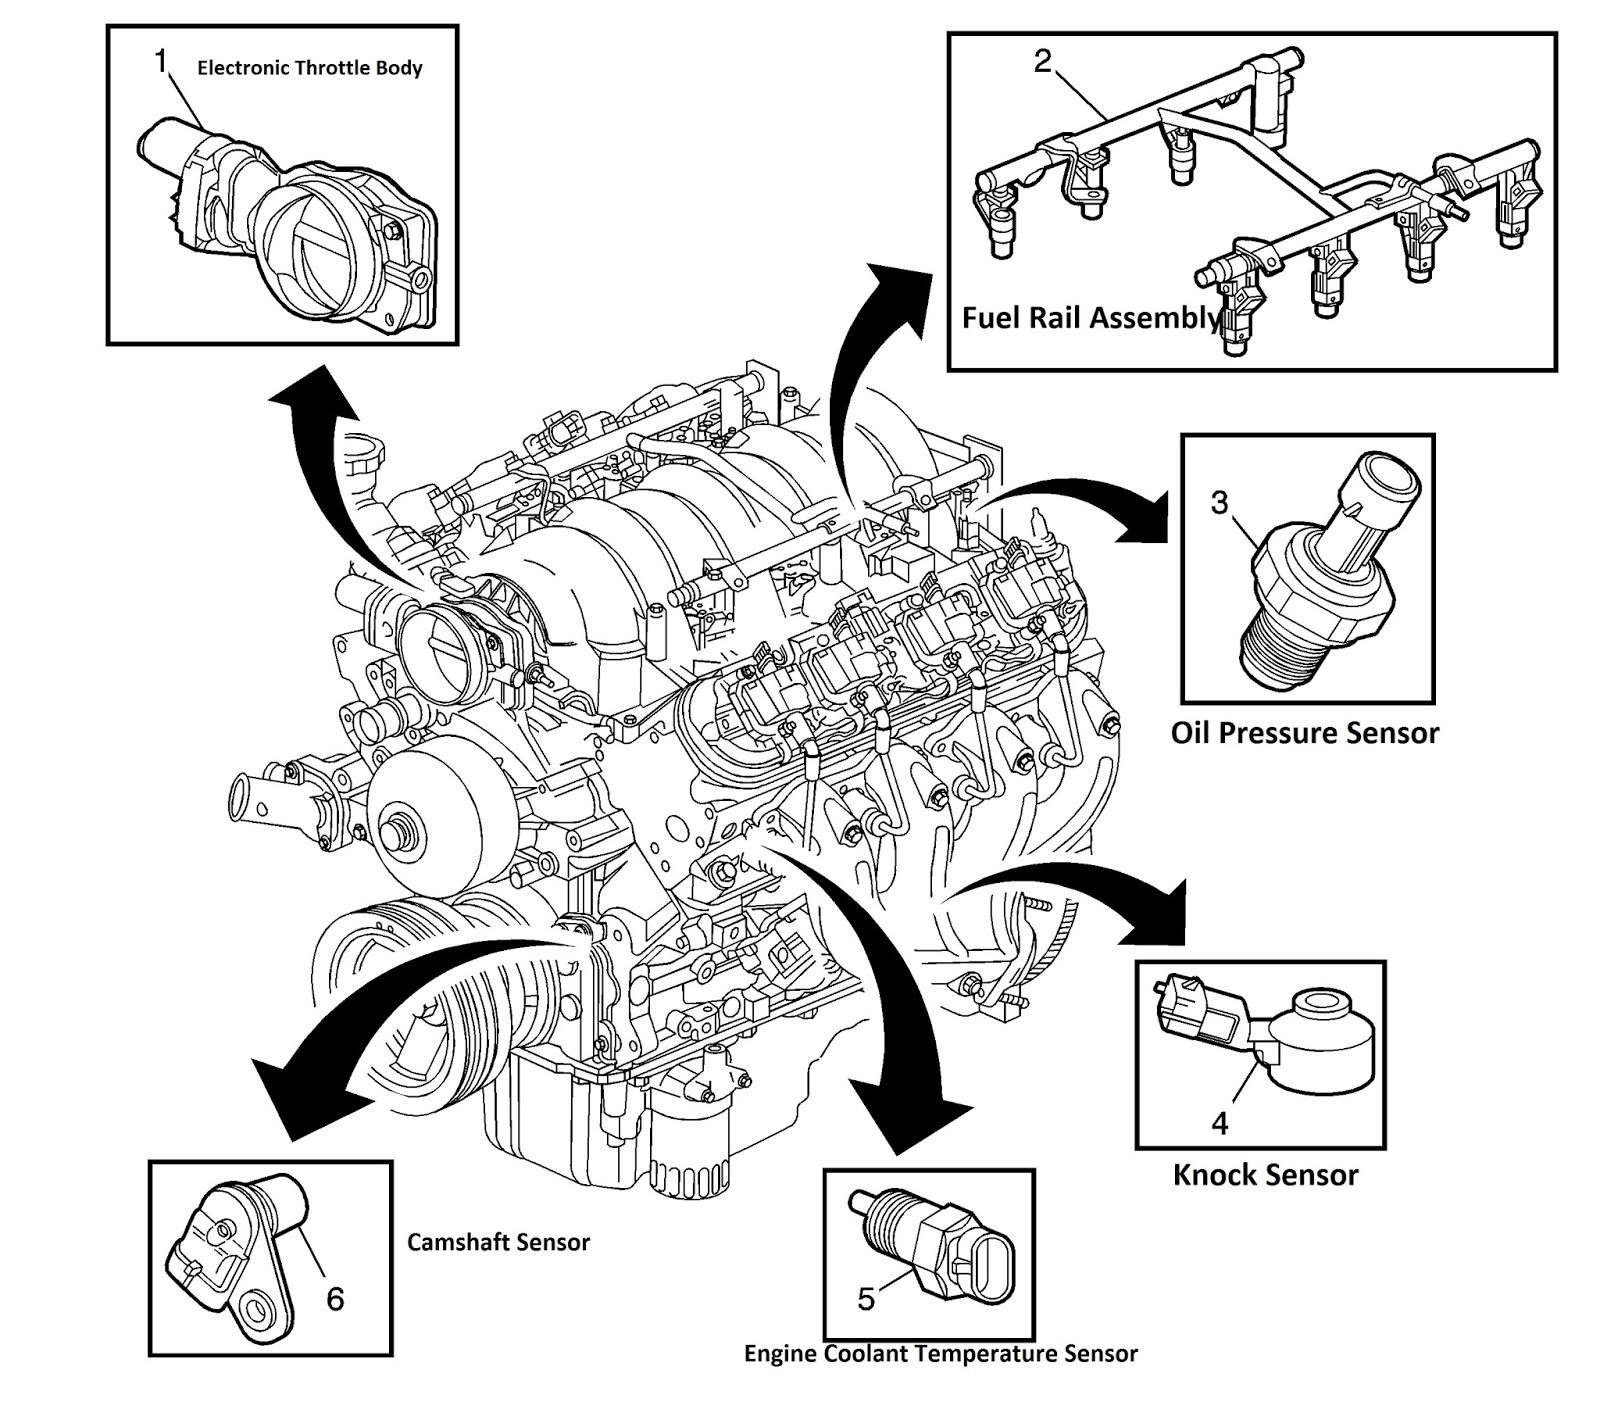 equinox ecm wiring diagram on chevrolet wiring diagram, 2009 cobalt  engine diagram,